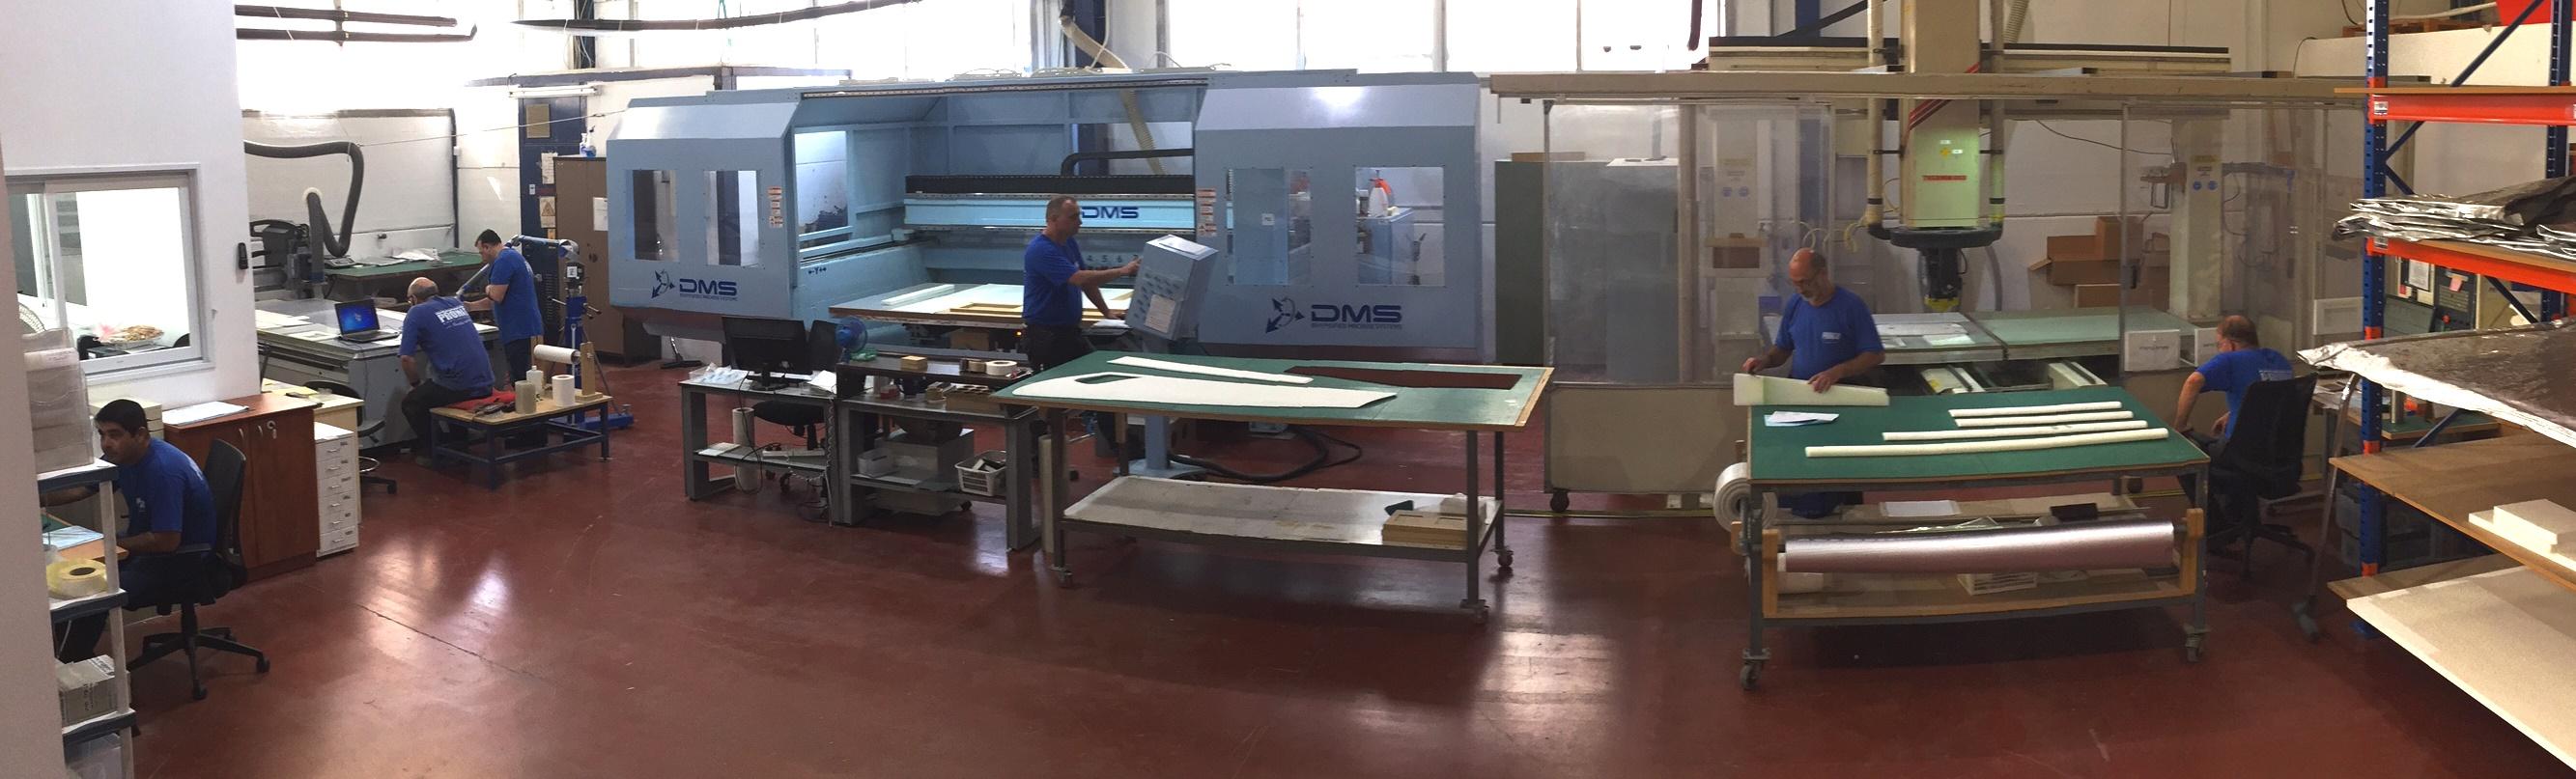 new CNC Machine shop -24.7.17